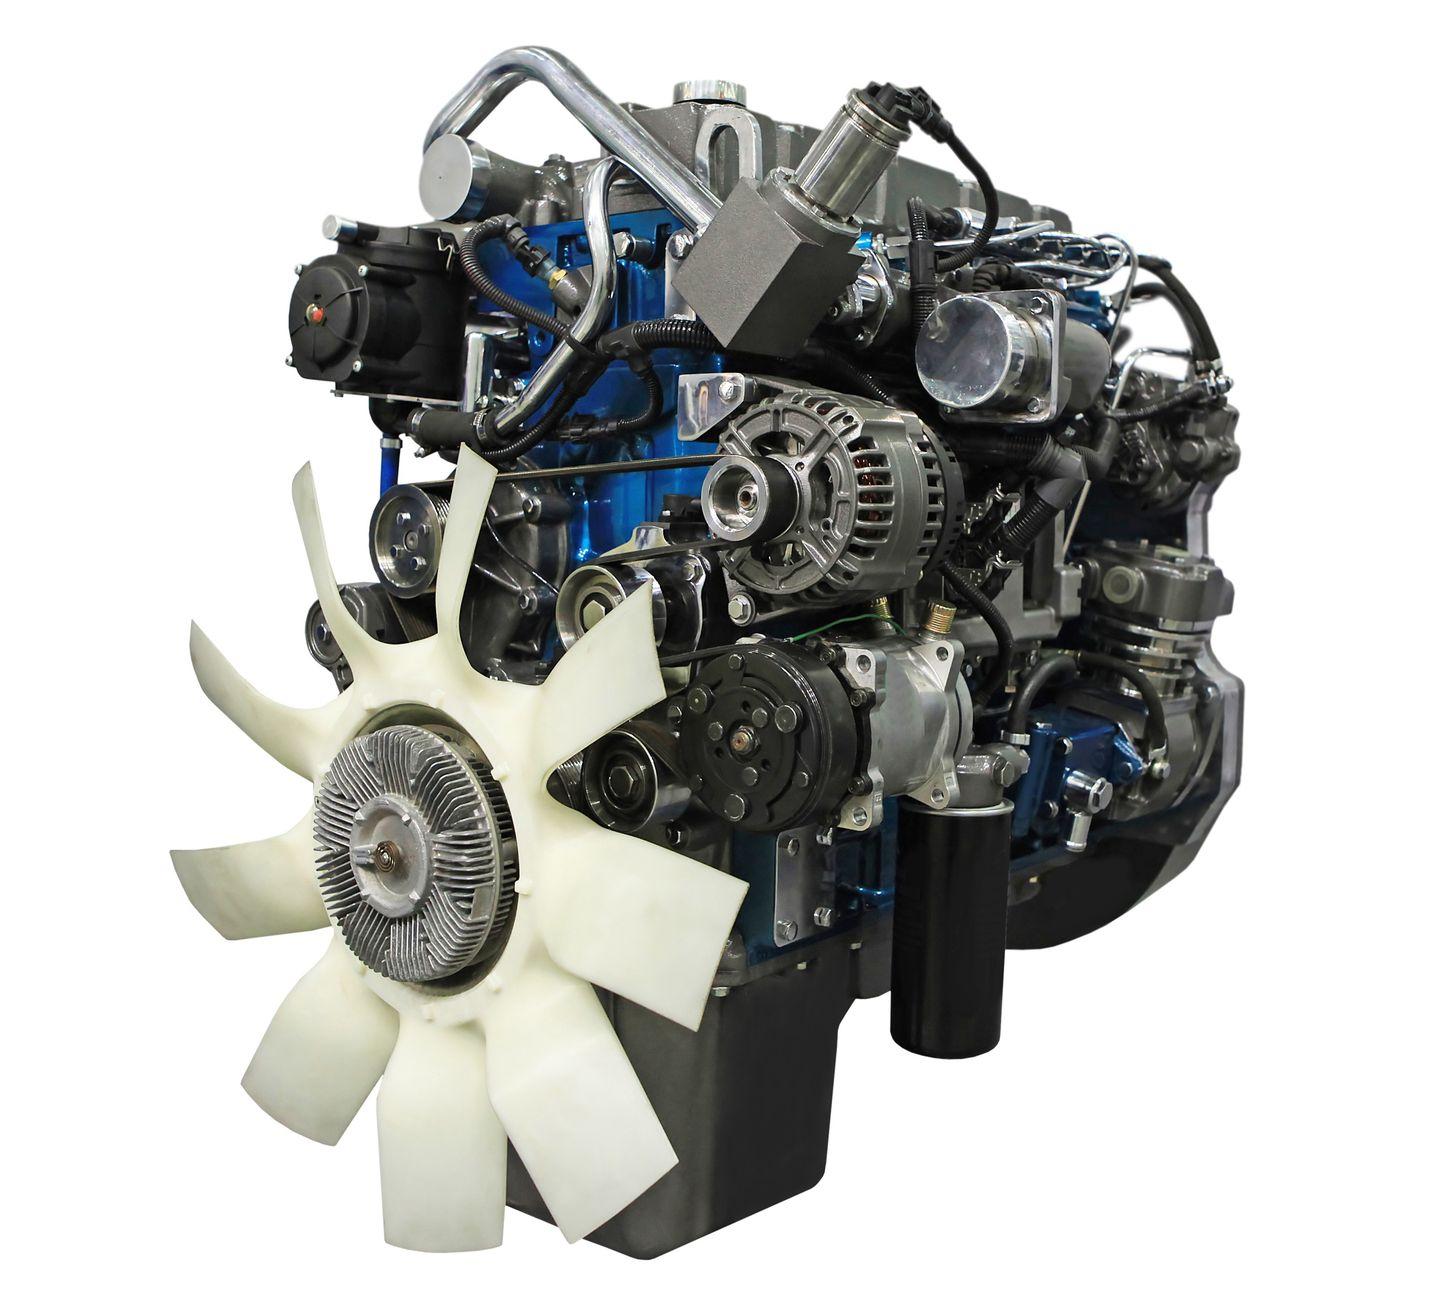 10689479 - close up shot of turbo  diesel engine